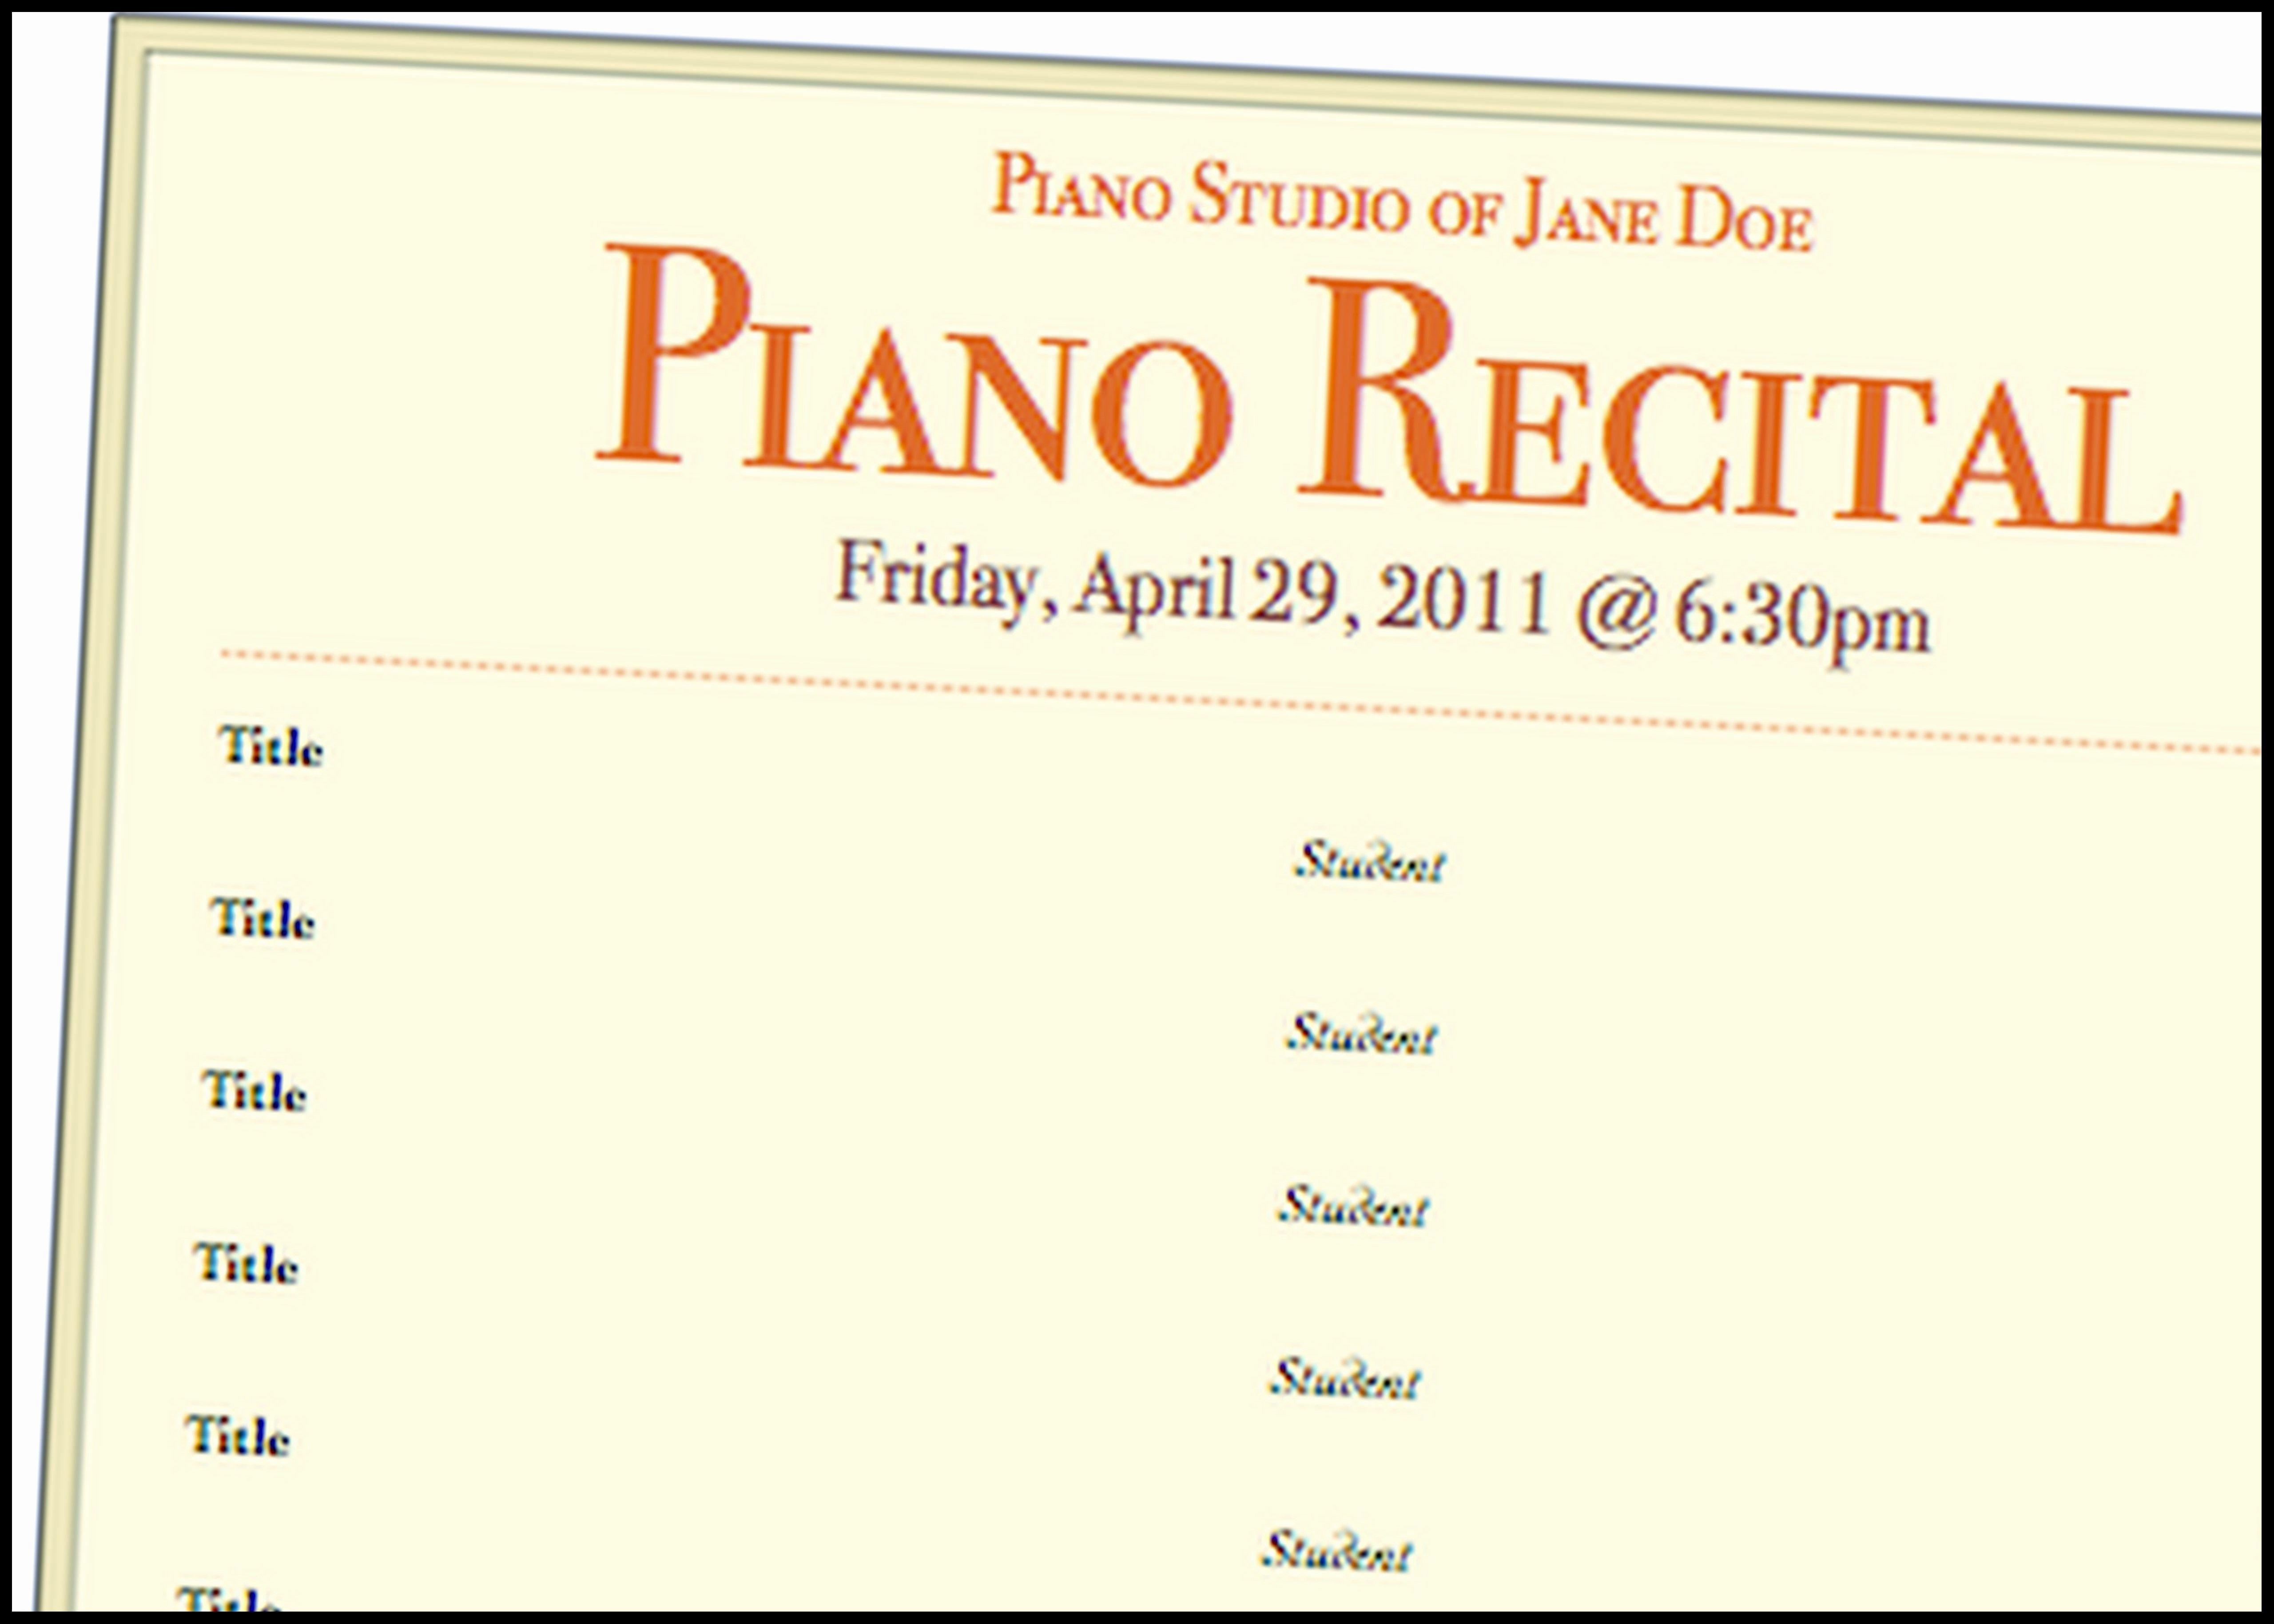 Concert Program Template Free Luxury A Basic Piano Recital Program Template for Free Music